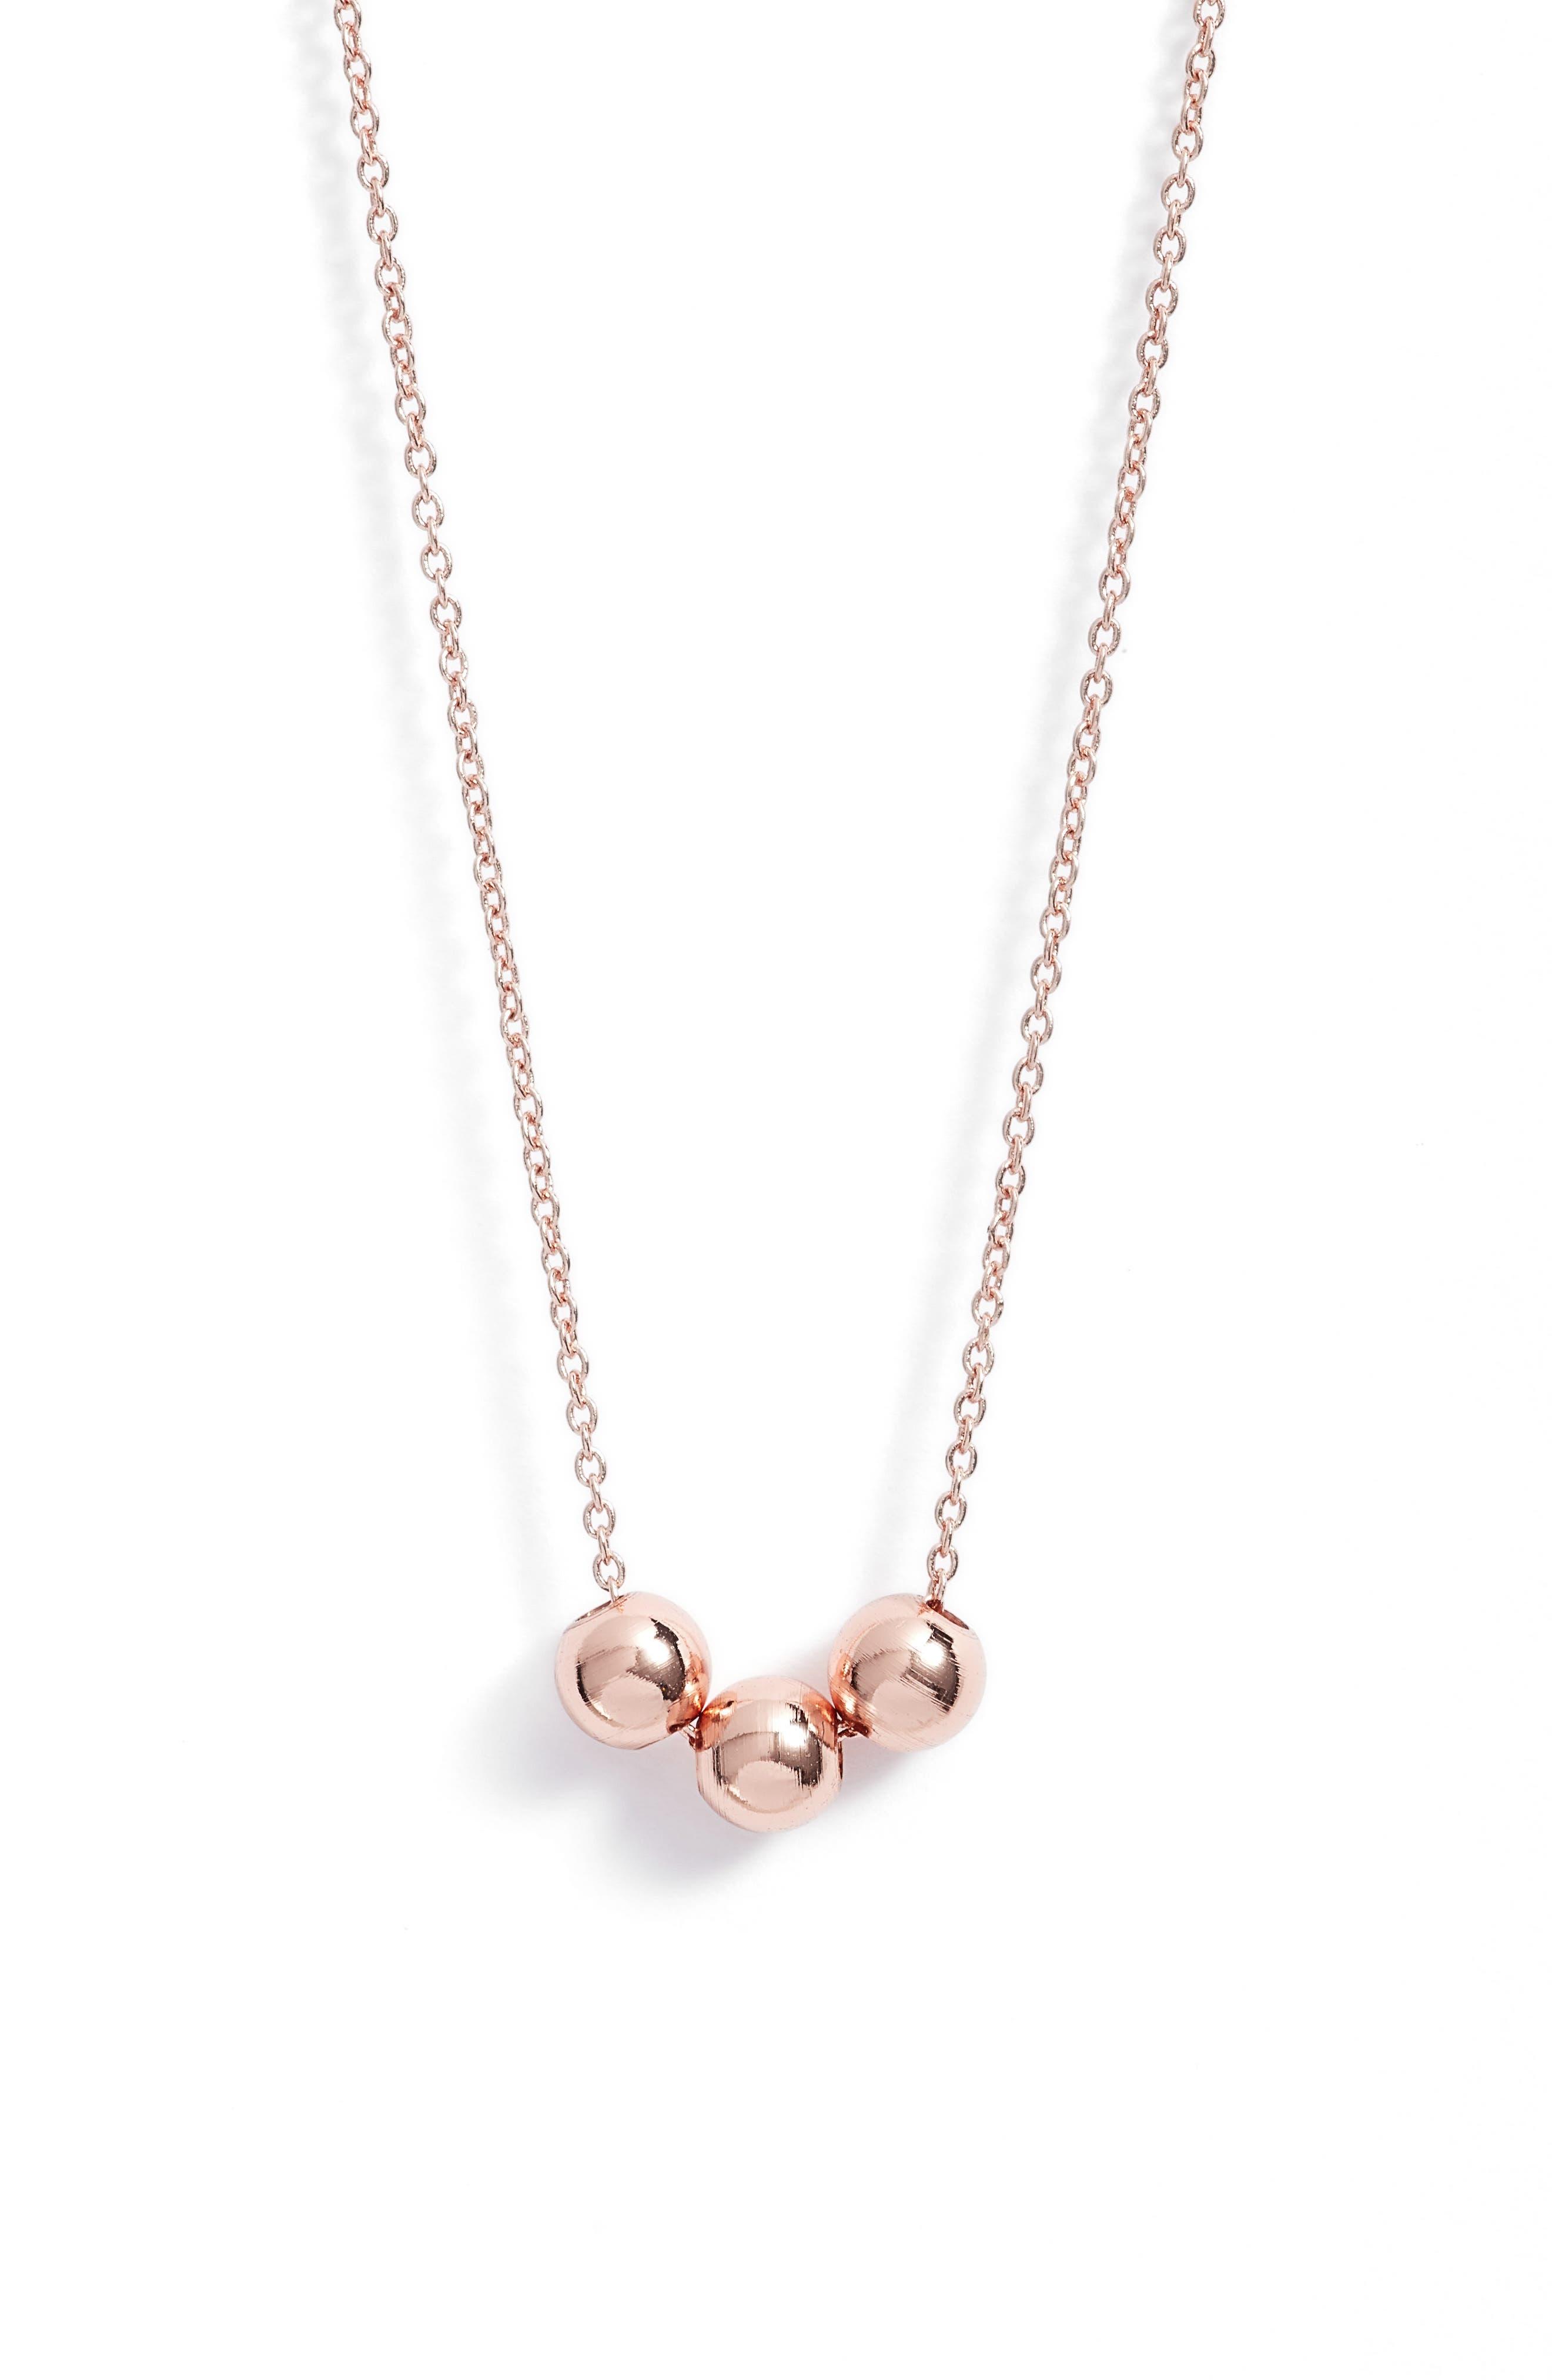 Main Image - gorjana Newport Beaded Necklace